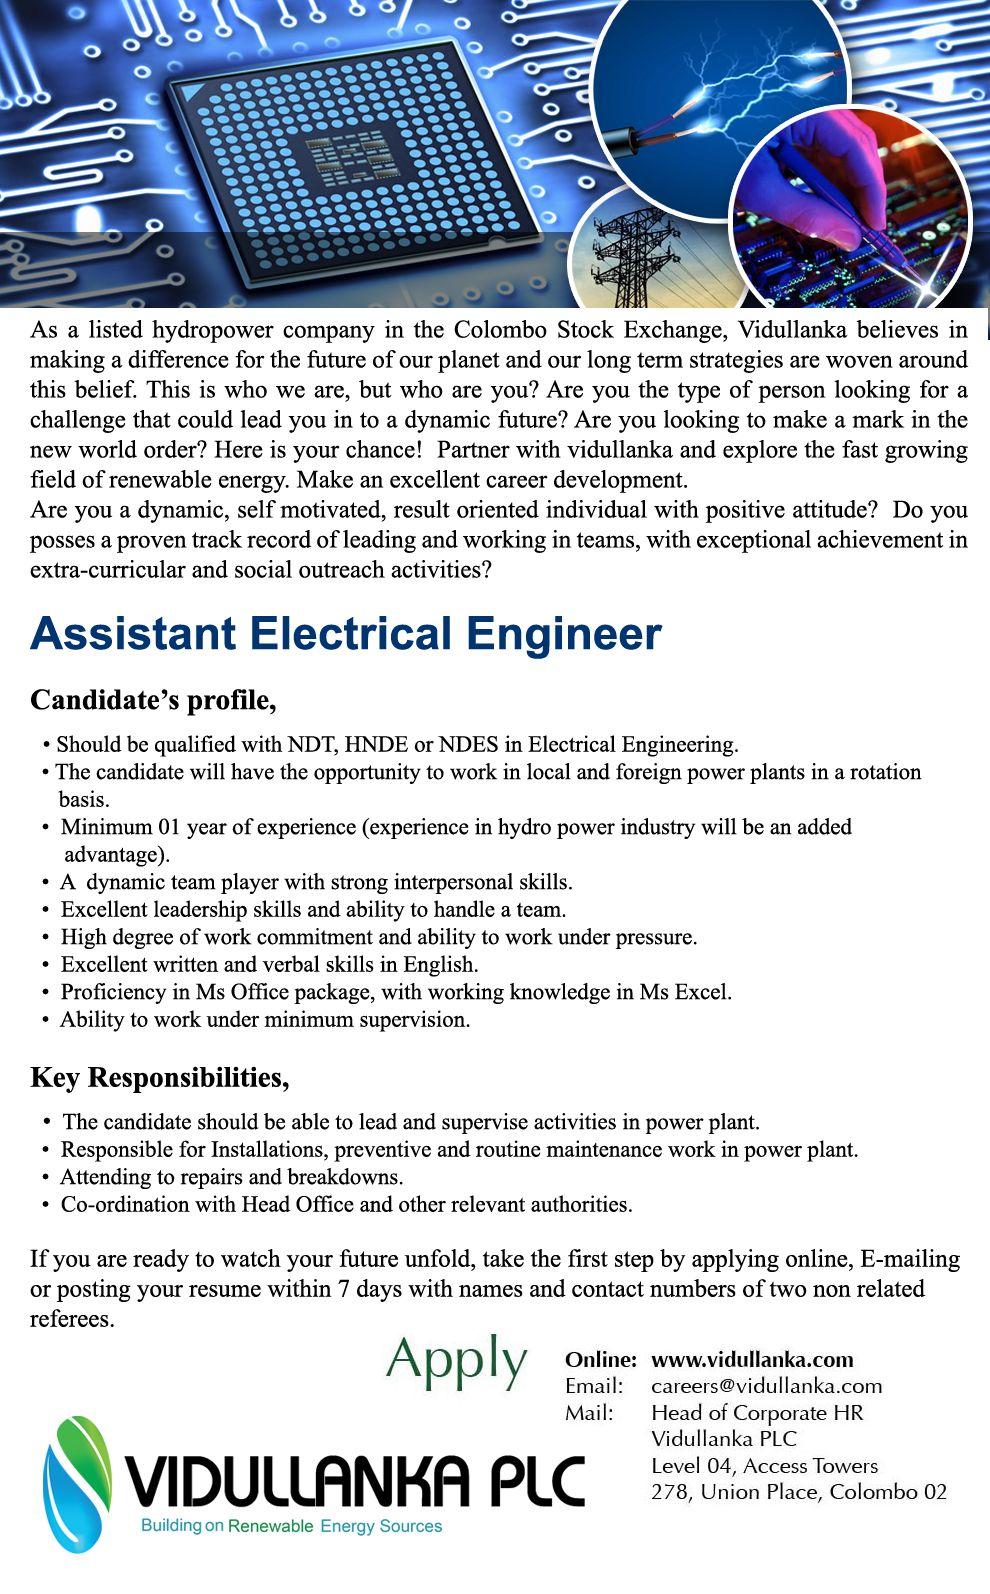 Assistant Electrical Engineer At Vidullanka Plc Career First Electrical Engineering Engineering Engineering Jobs